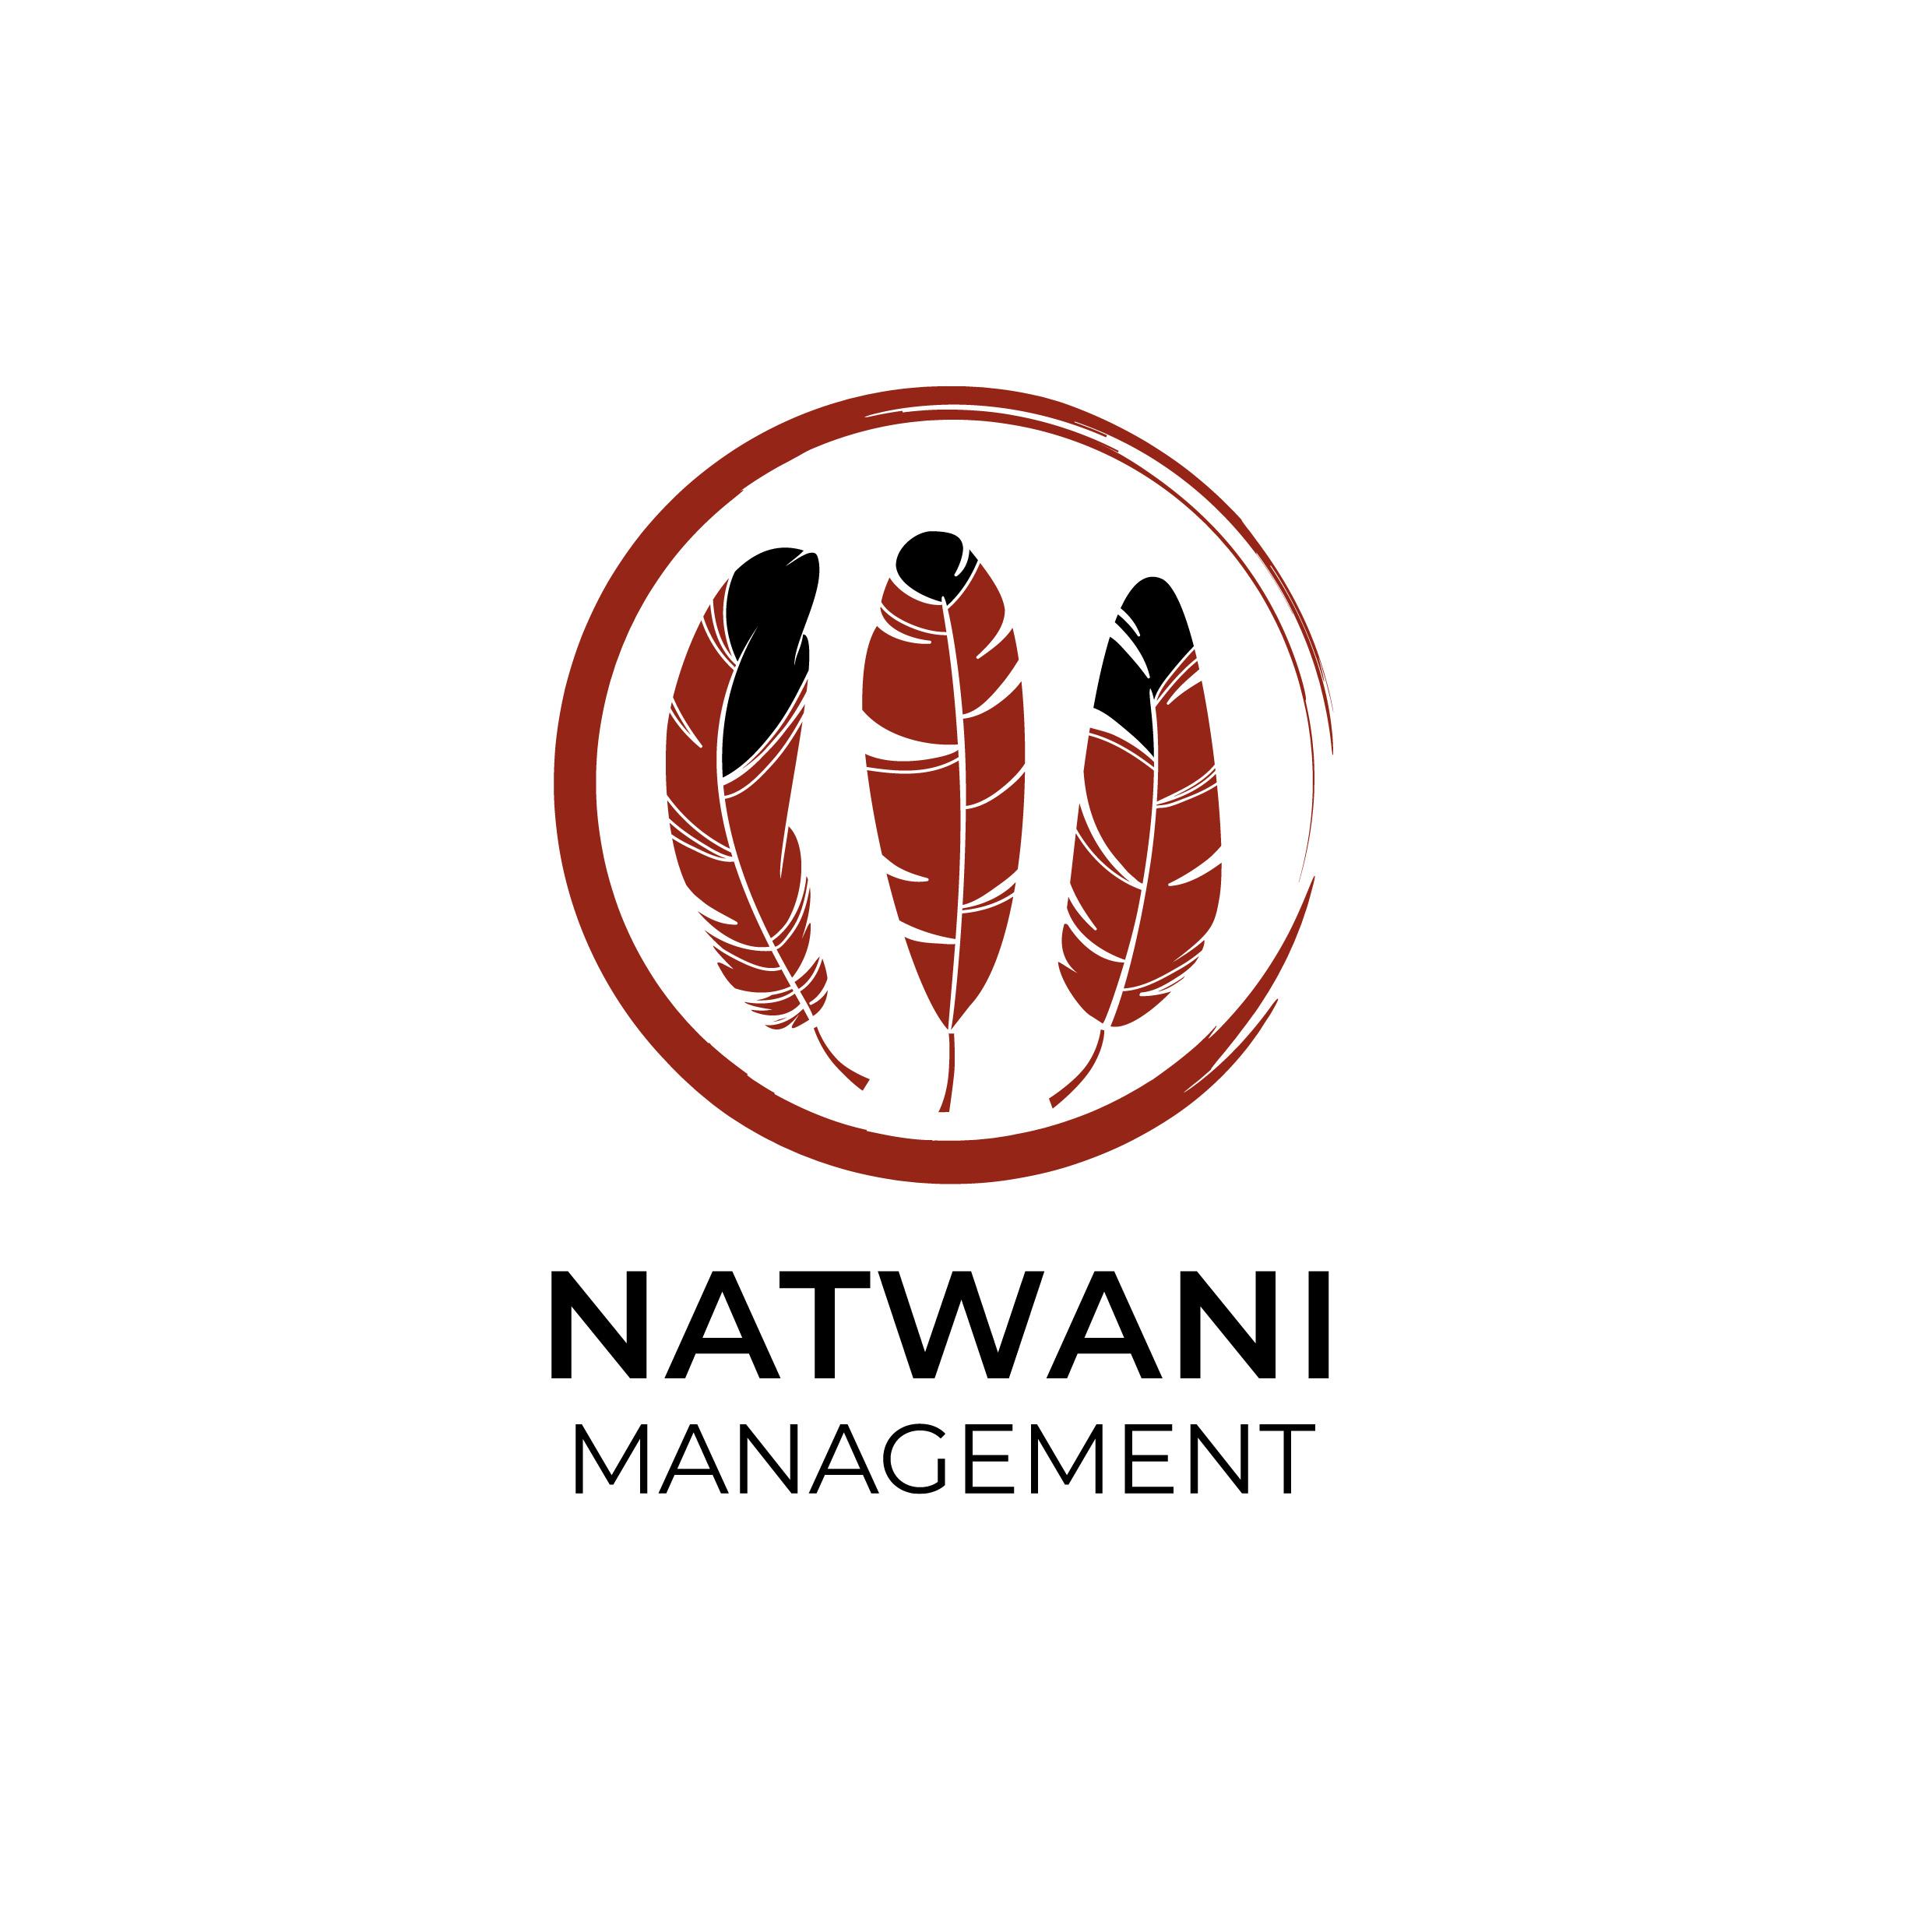 NATWANI MANAGEMENT • Logotype